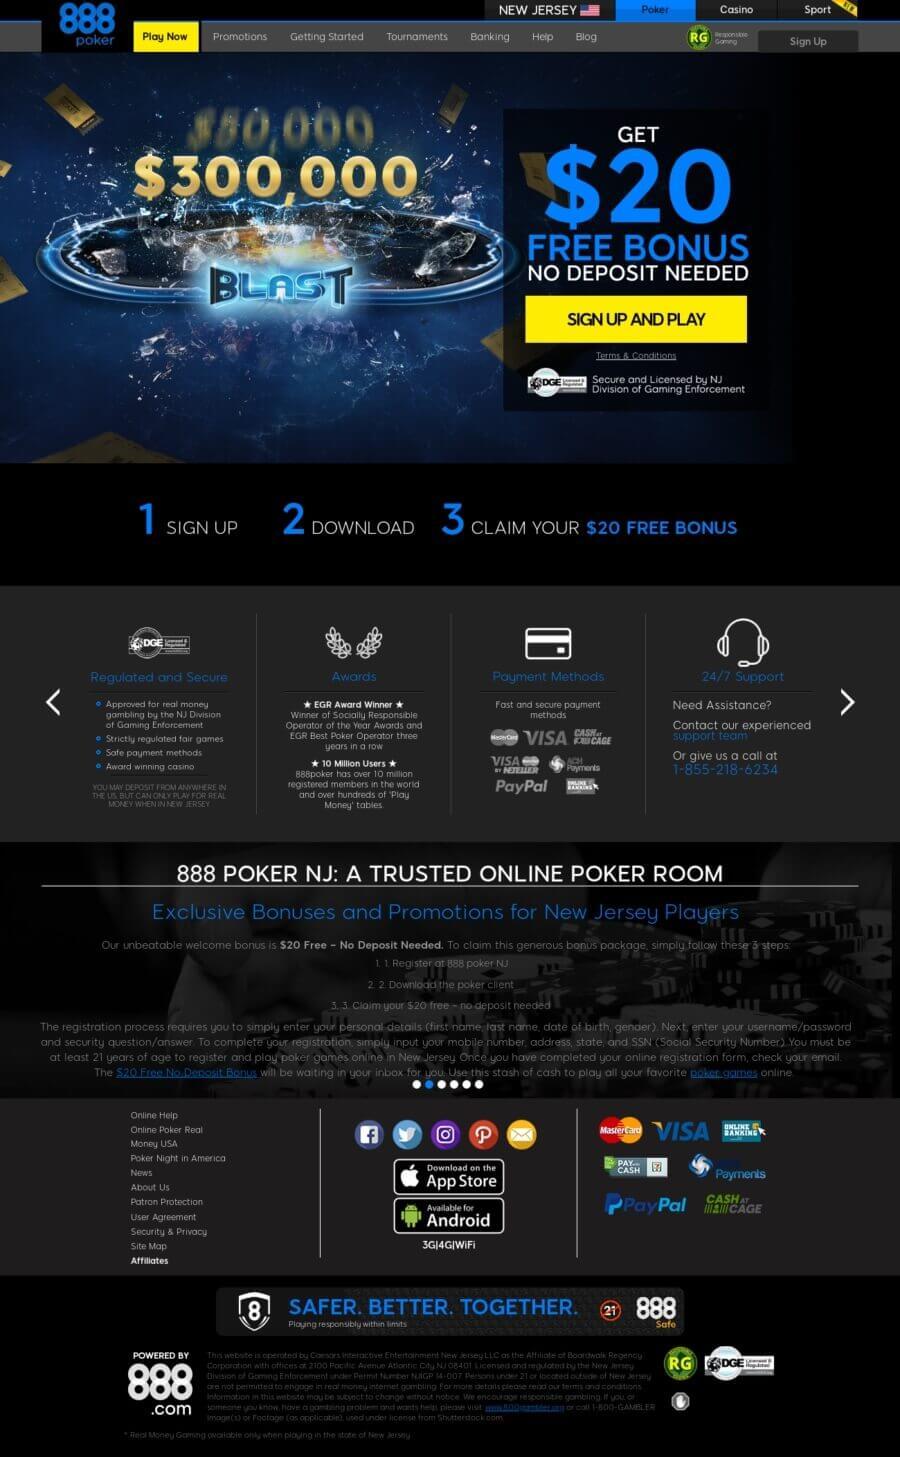 888 Online Poker New Jersey $20 Free No deposit needed